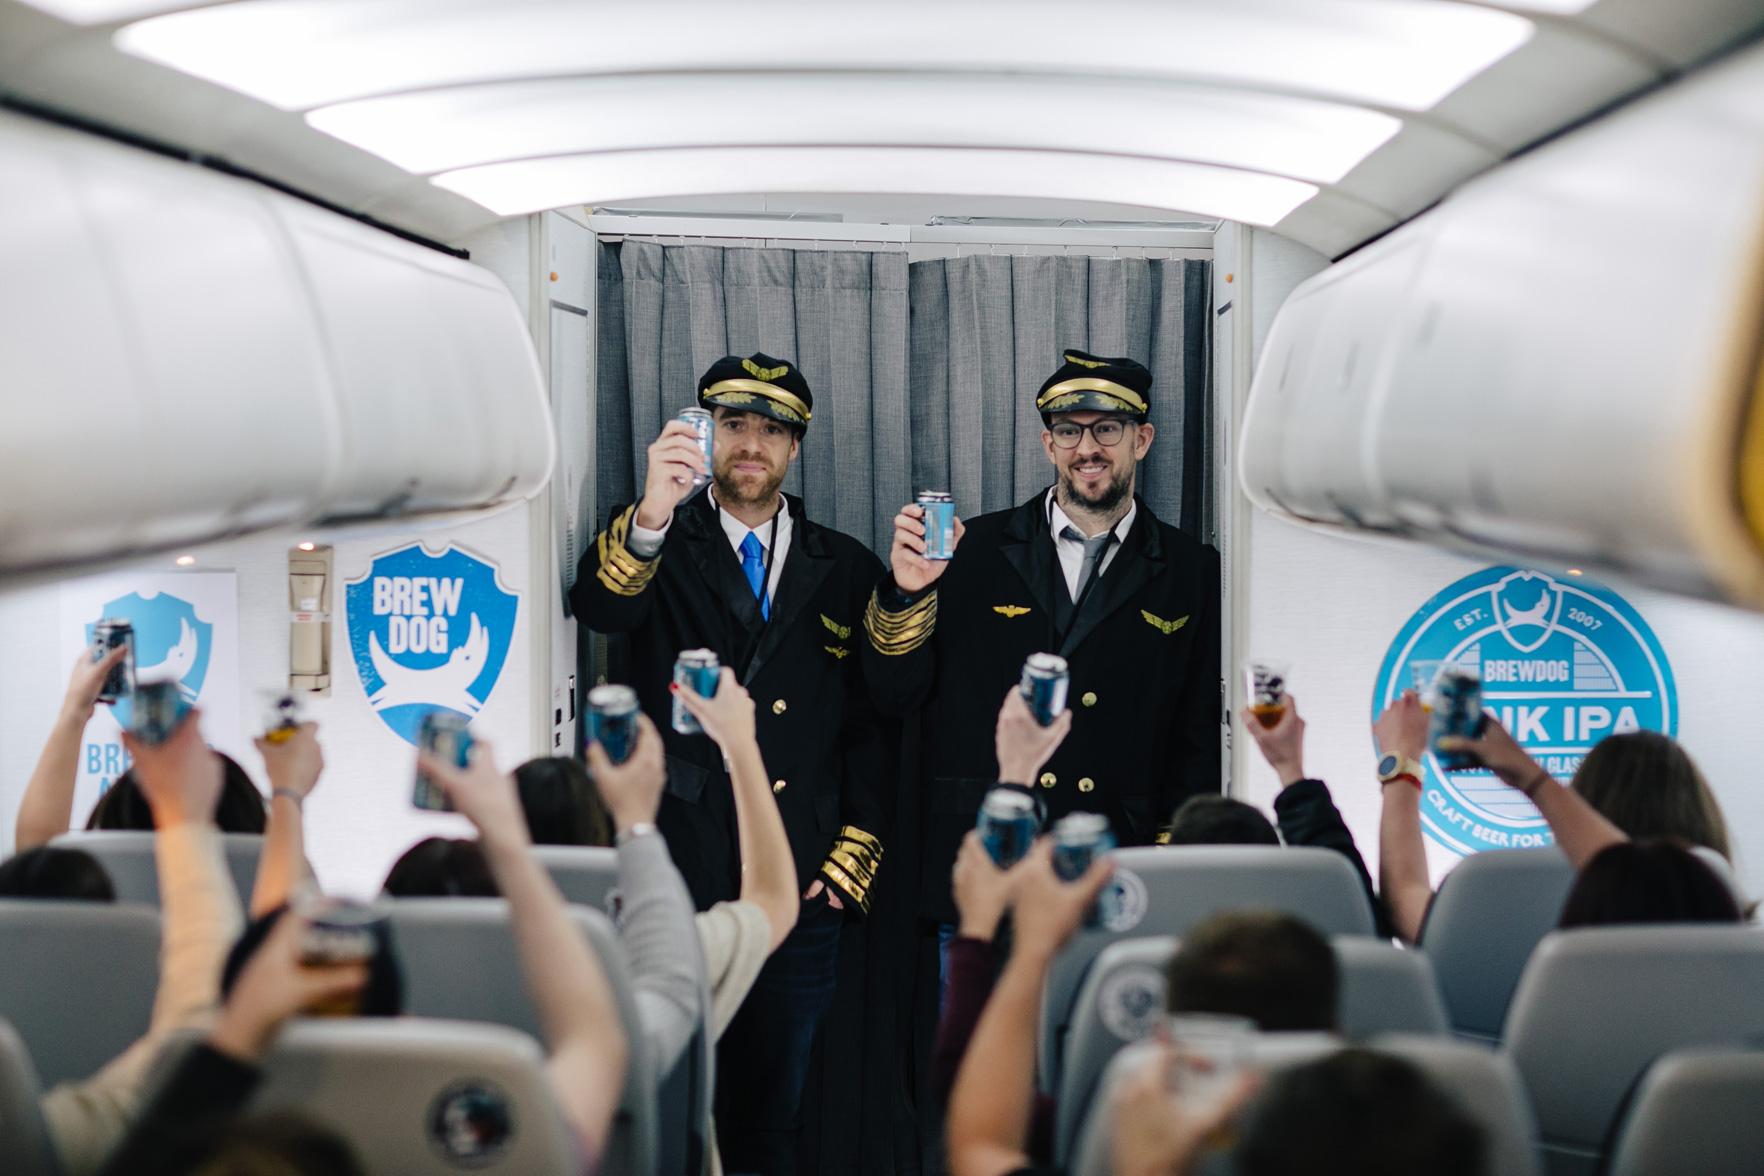 pivovari-pivovary-pivo-brewdog-beer-airlines-02-sm